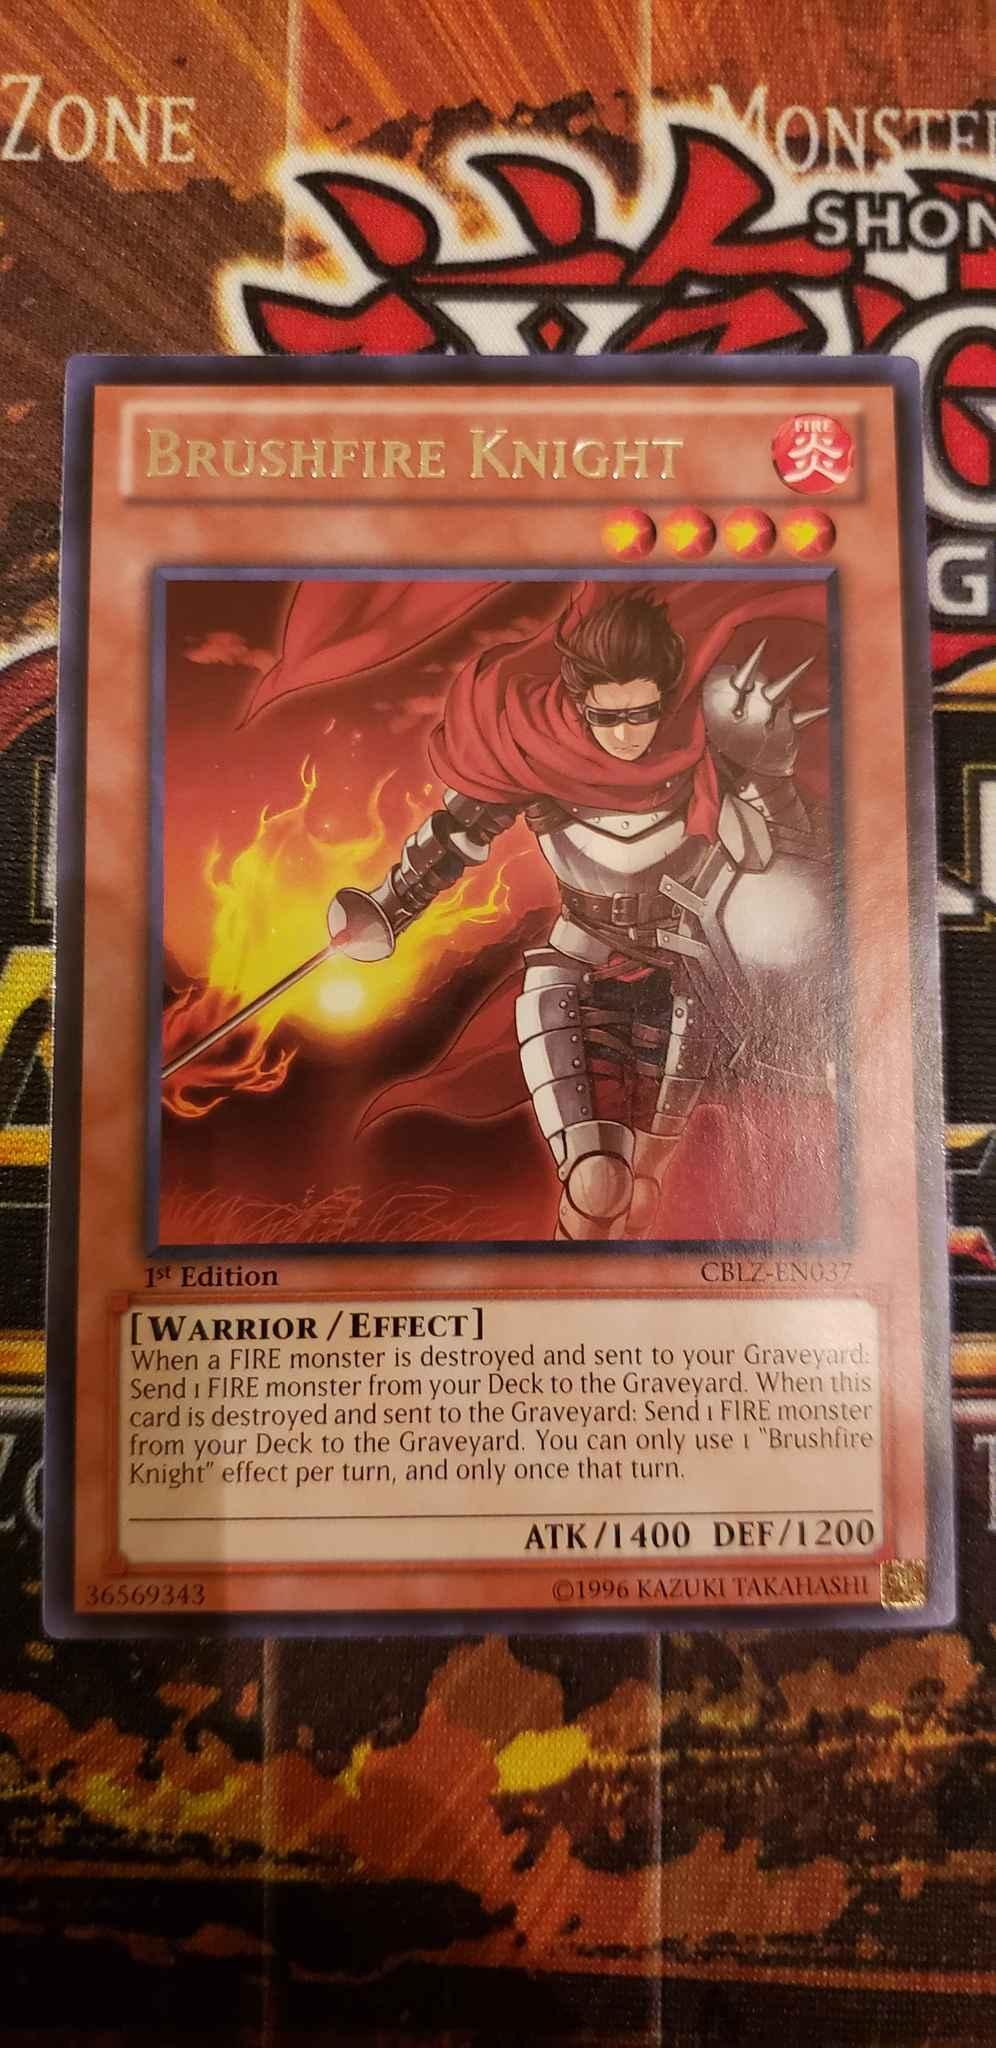 CBLZ-EN037 Brushfire Knight Rare Mint YuGiOh Card